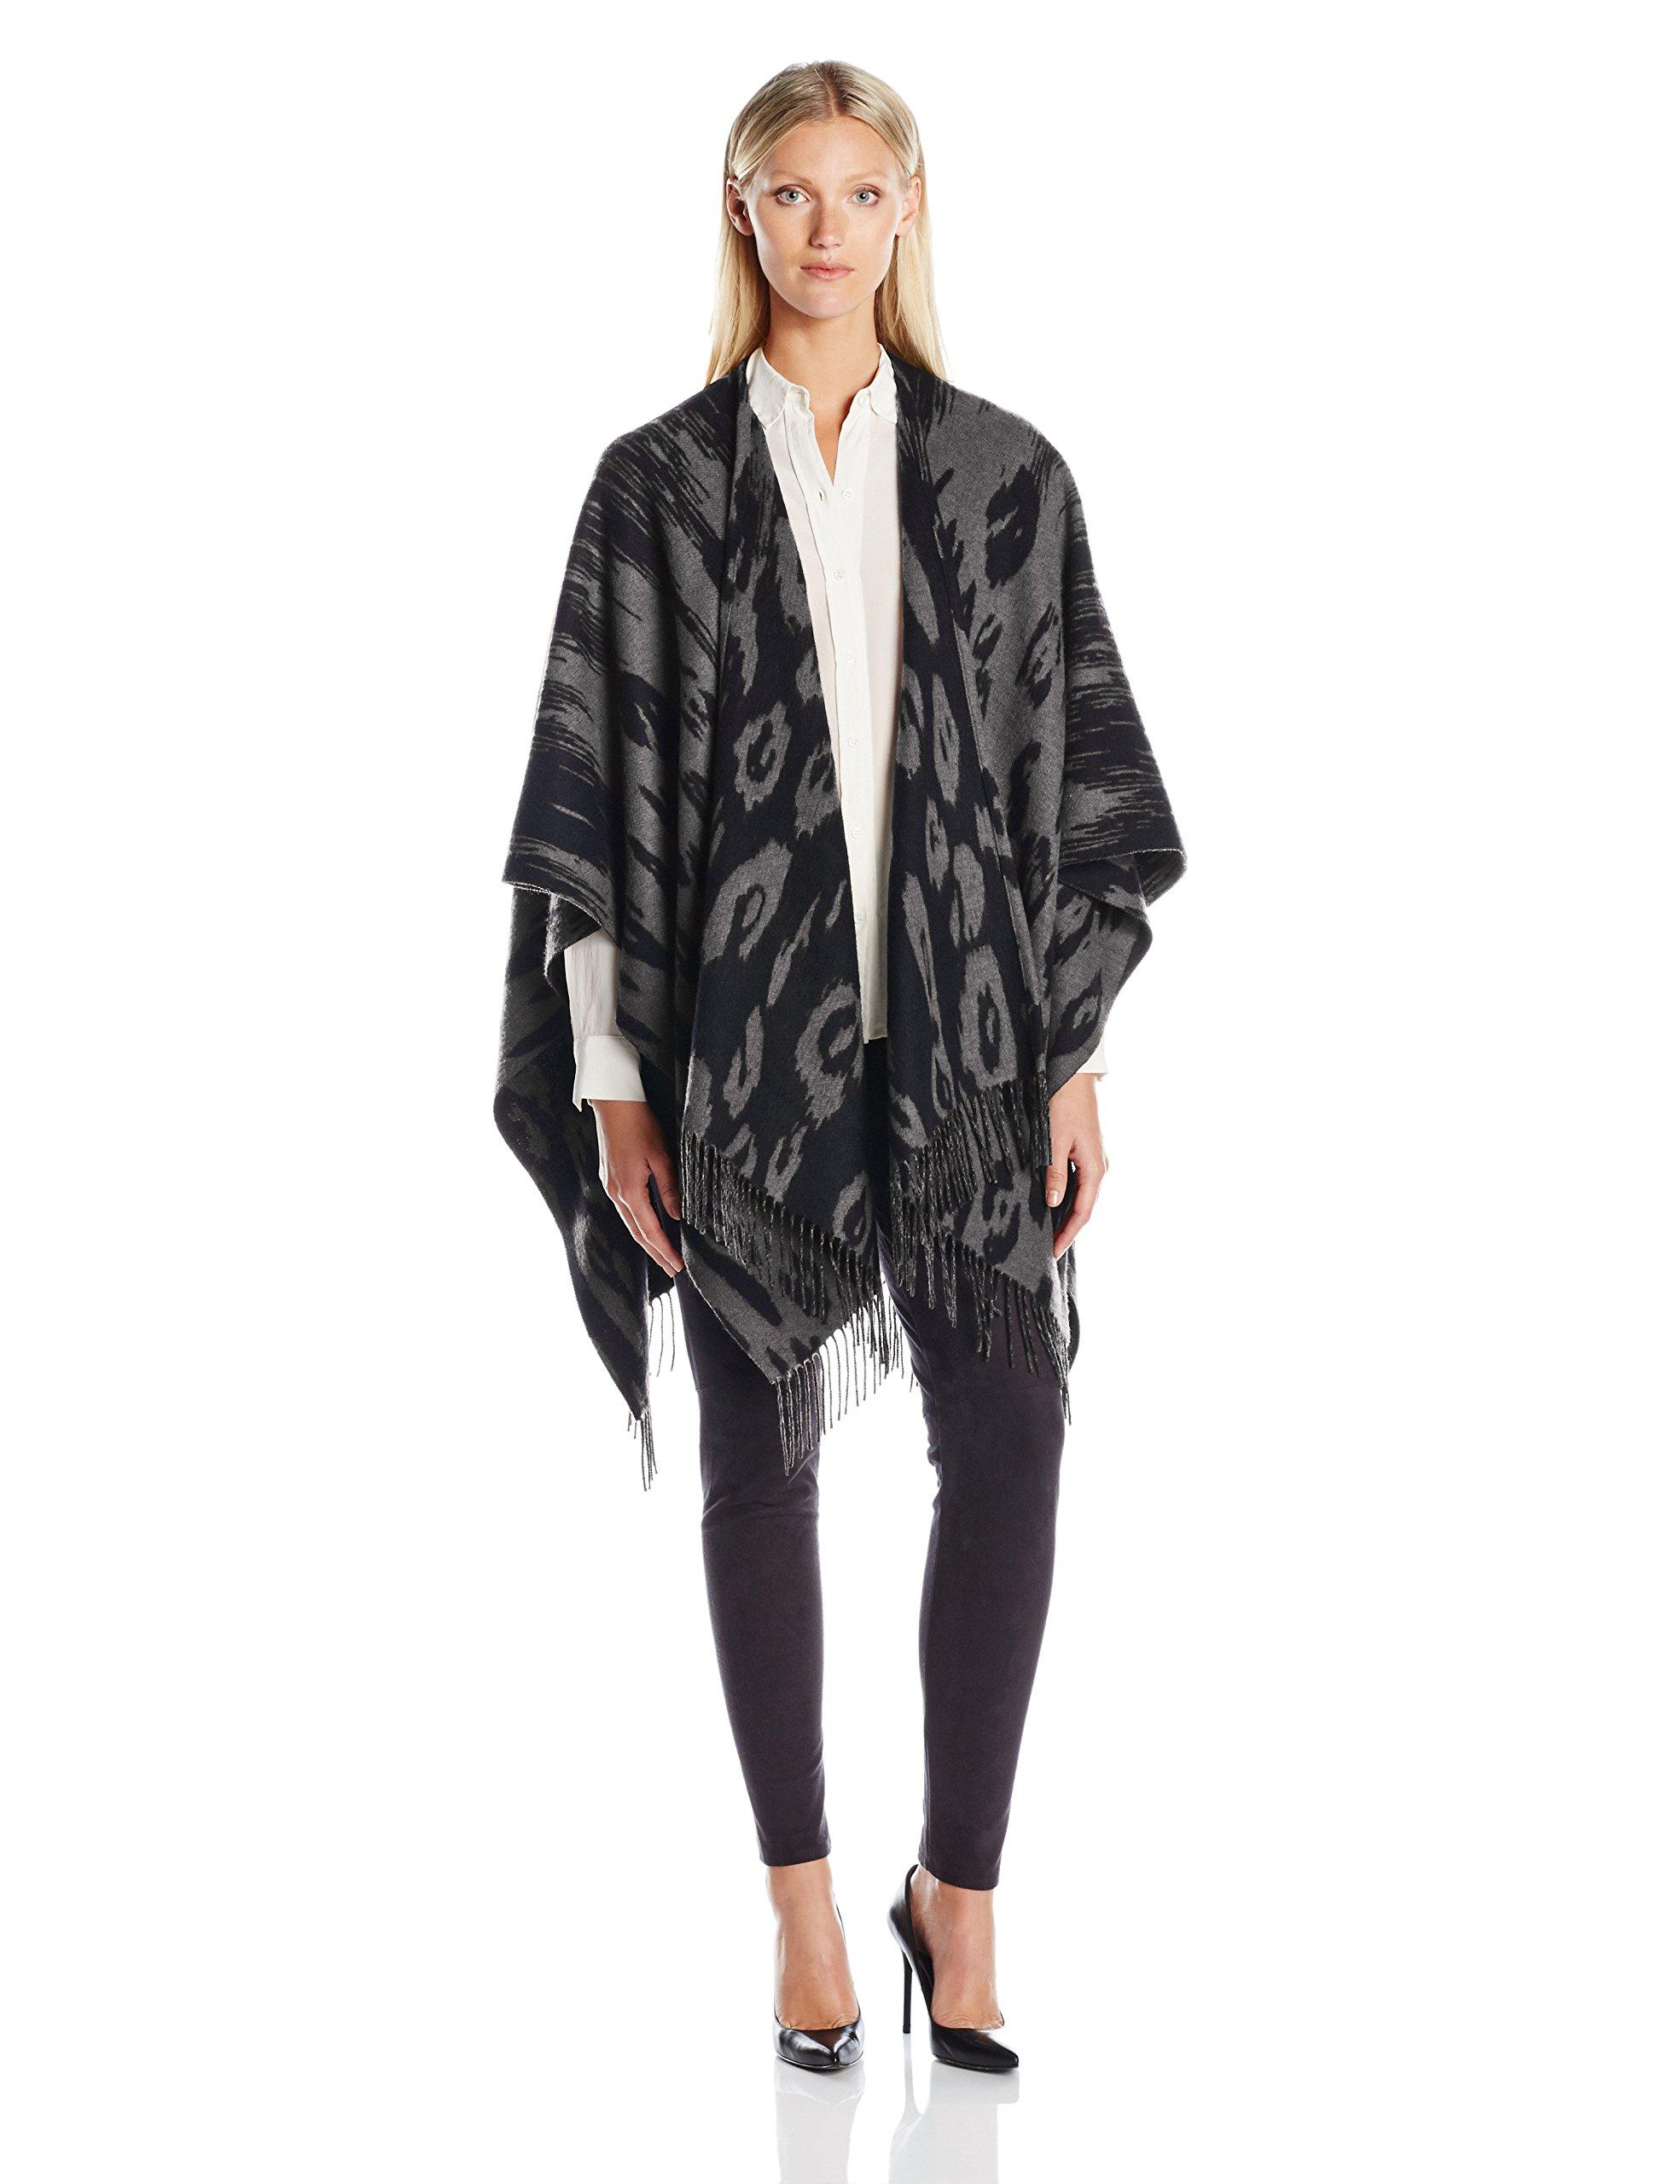 Phenix Cashmere Women's Ocelot Merino Wool Jacquard Ruana, Derby Grey/Black, One Size